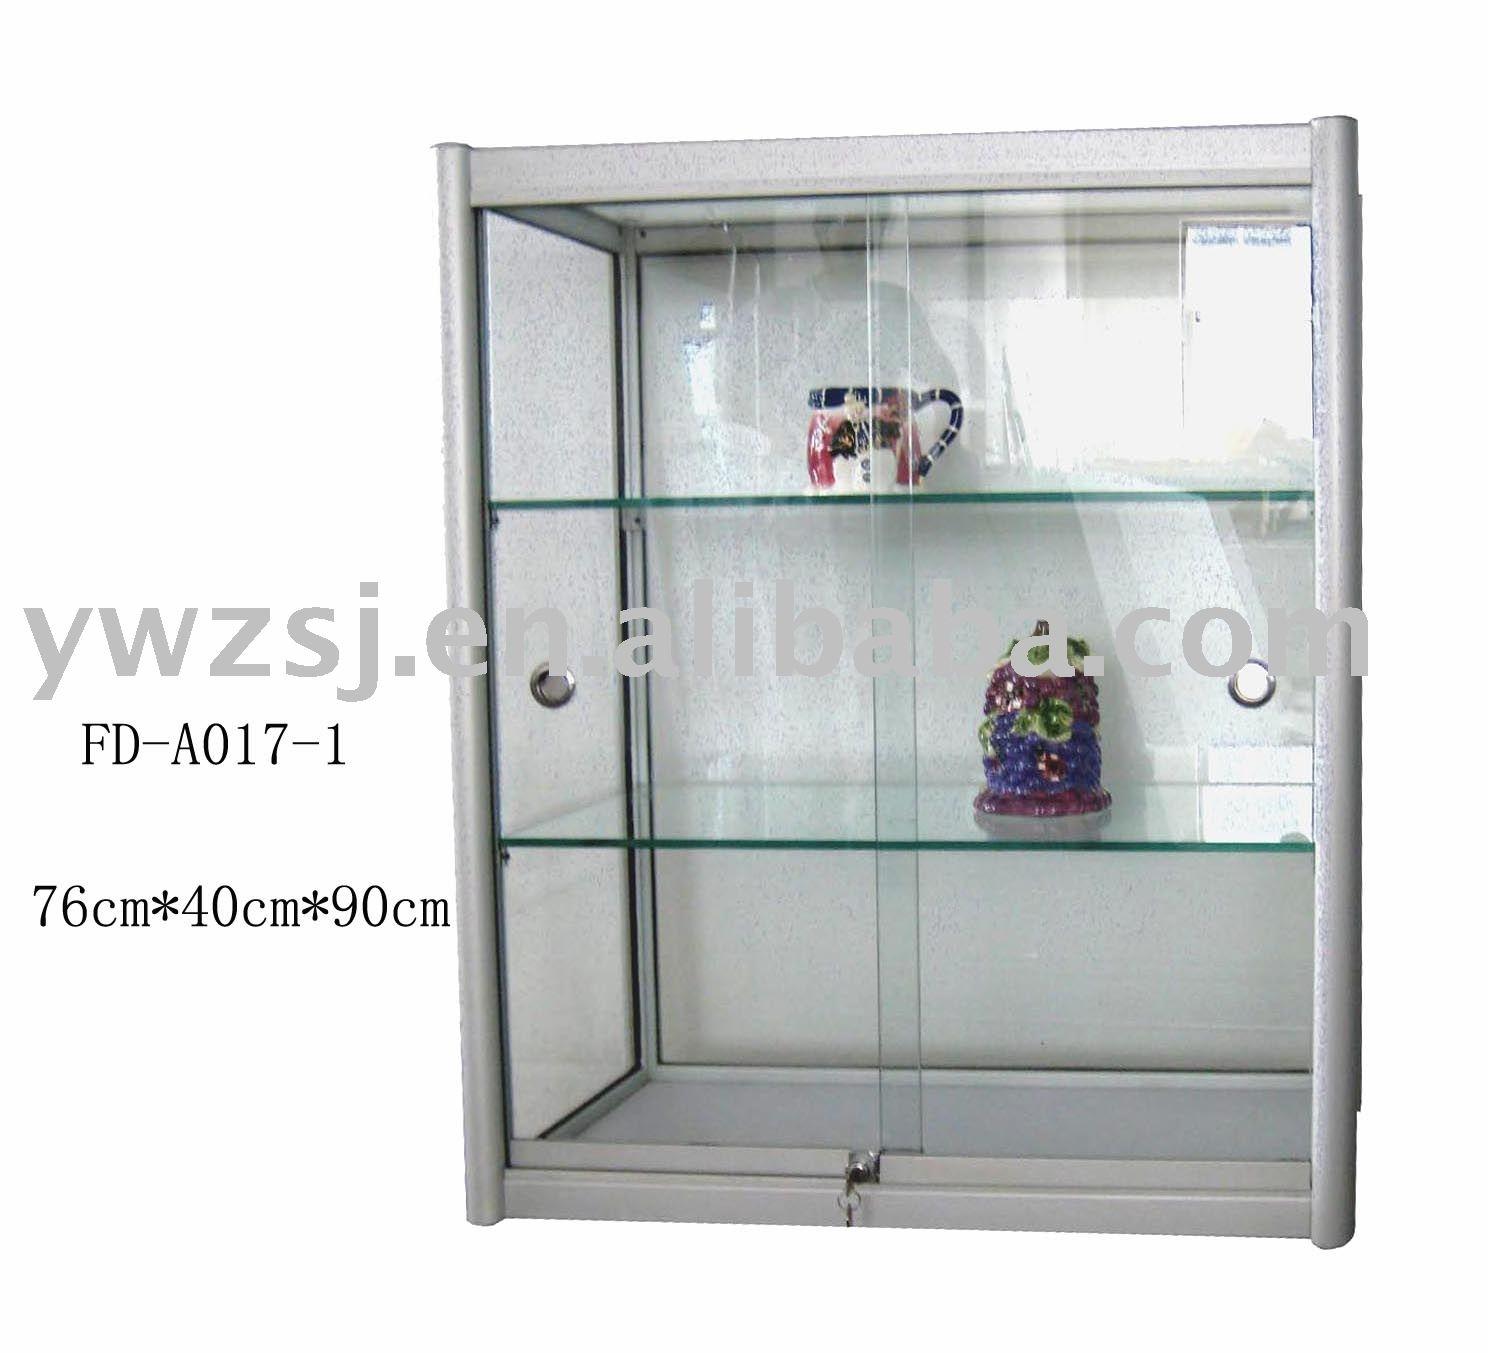 Storage Cabinet With Sliding Glass Doors Httpdivulgamaisweb